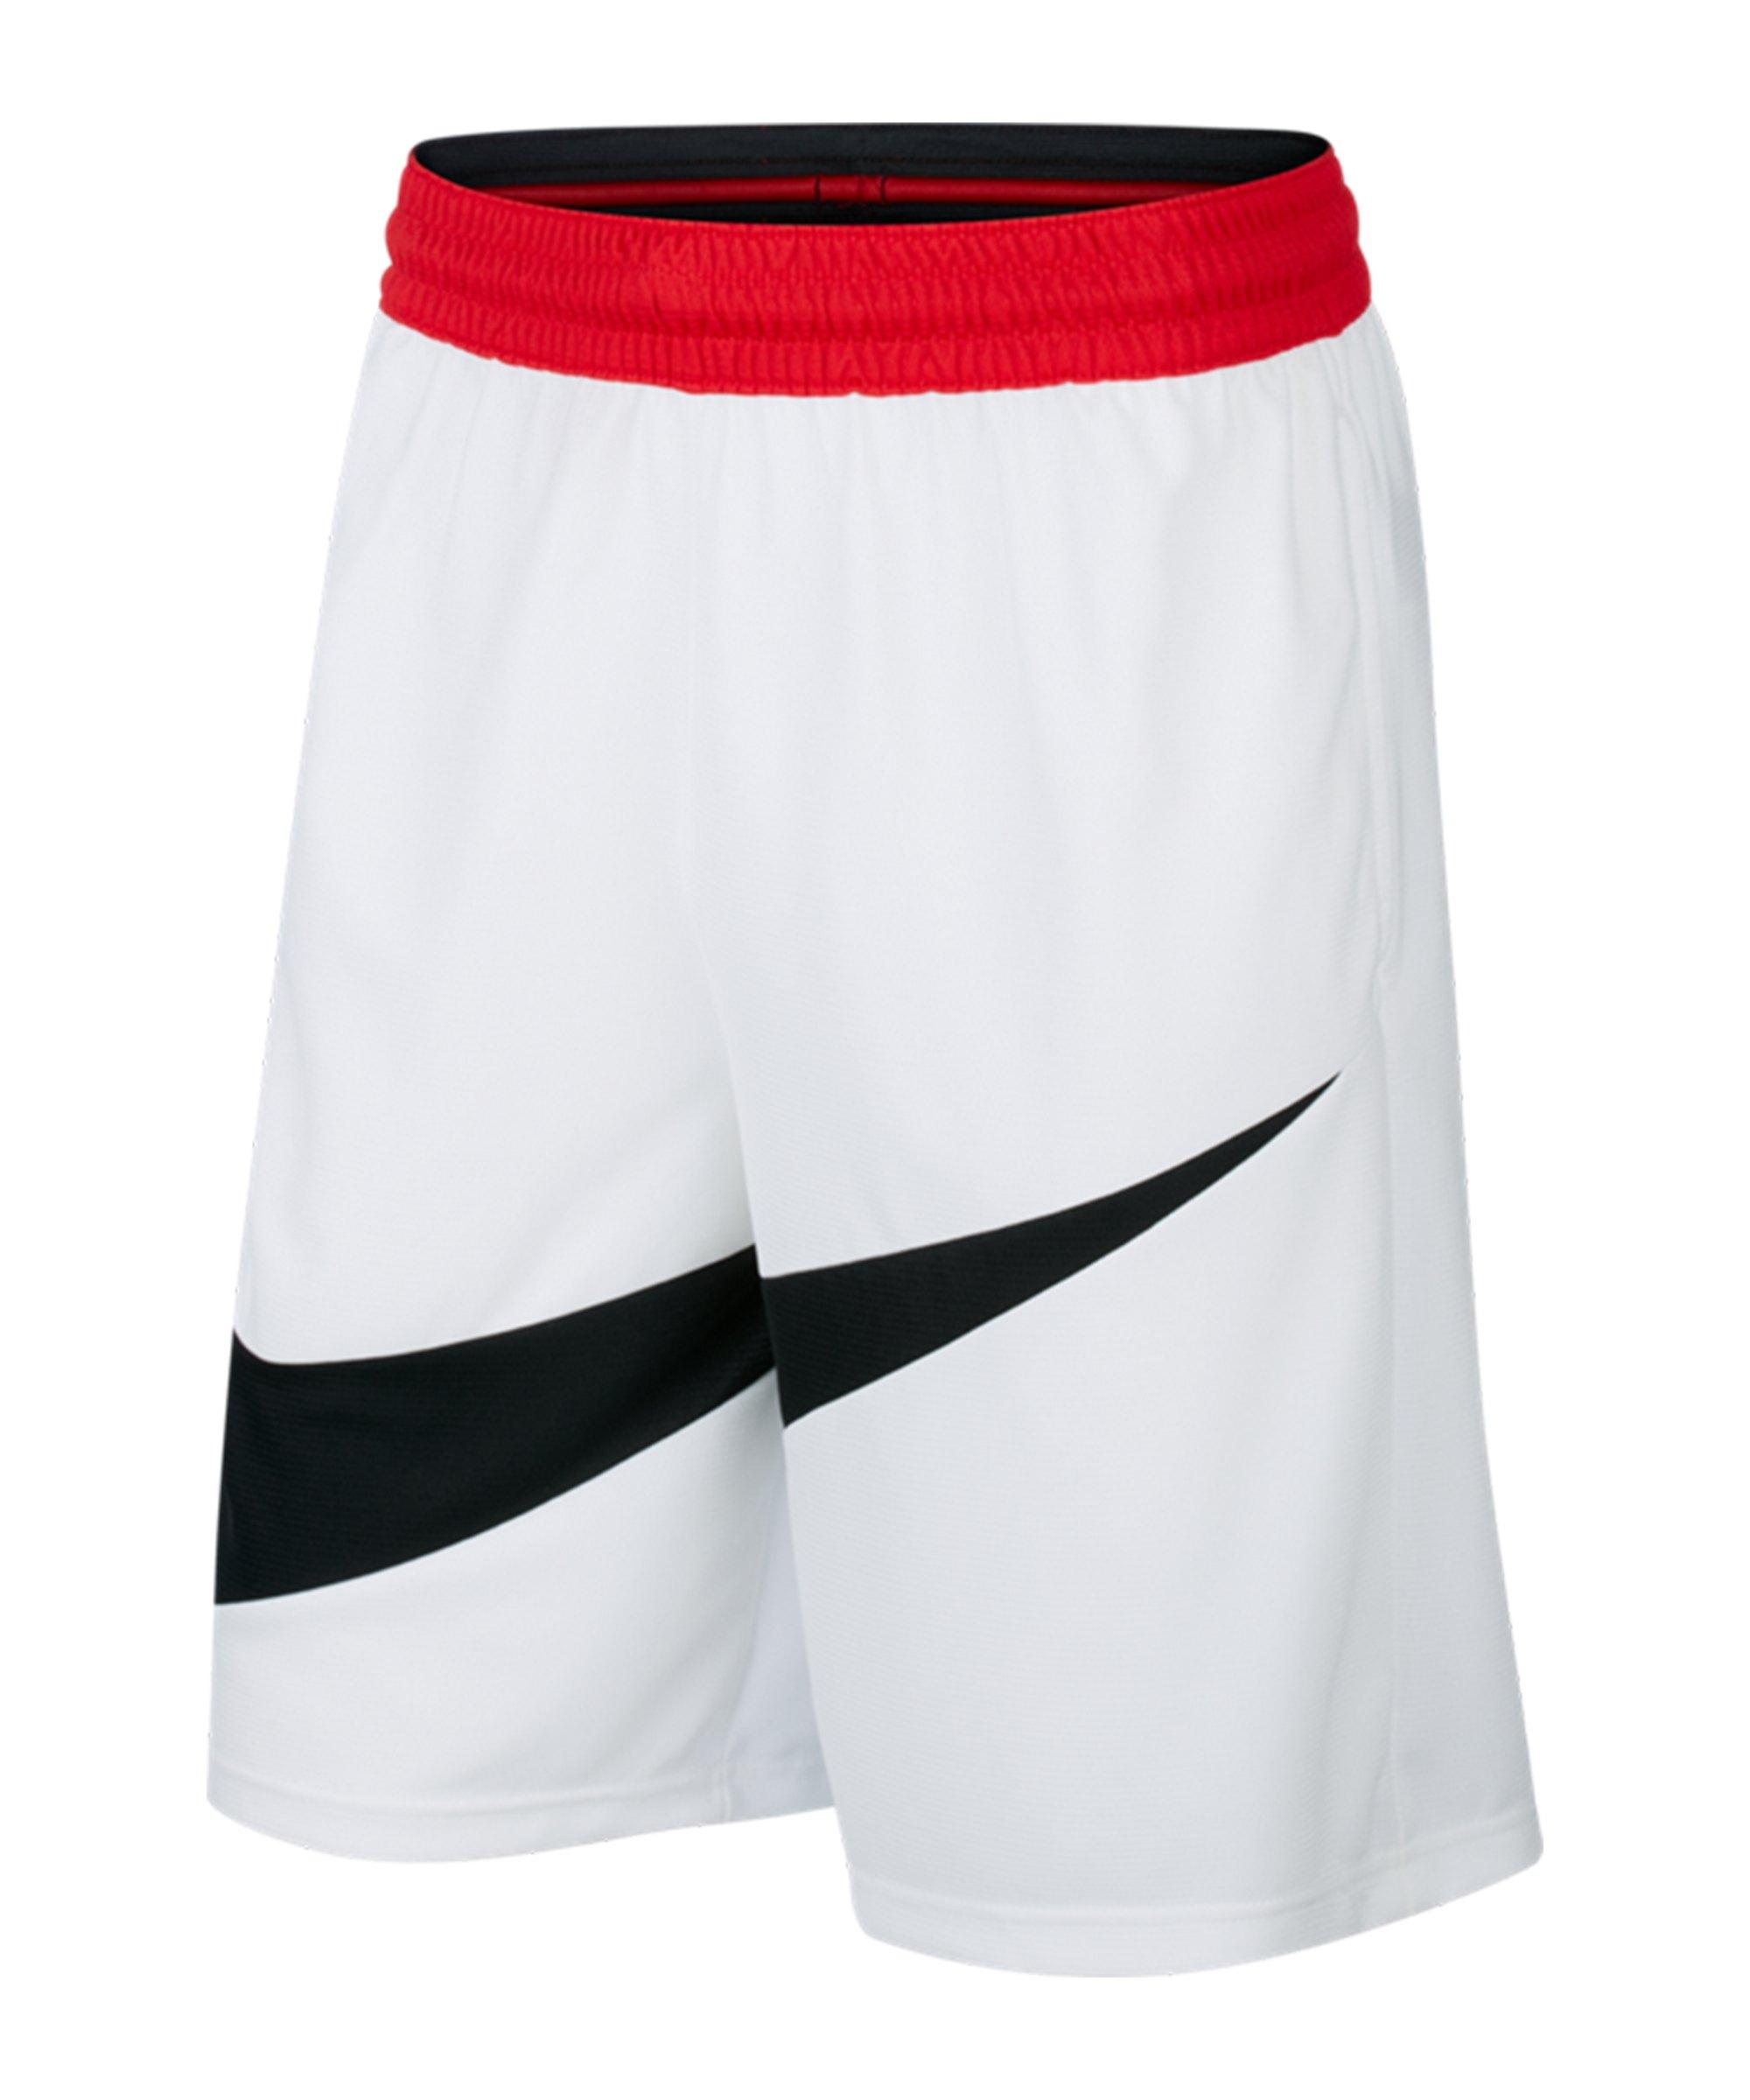 Nike HBR 2.0 Short Weiss Schwarz F100 - weiss